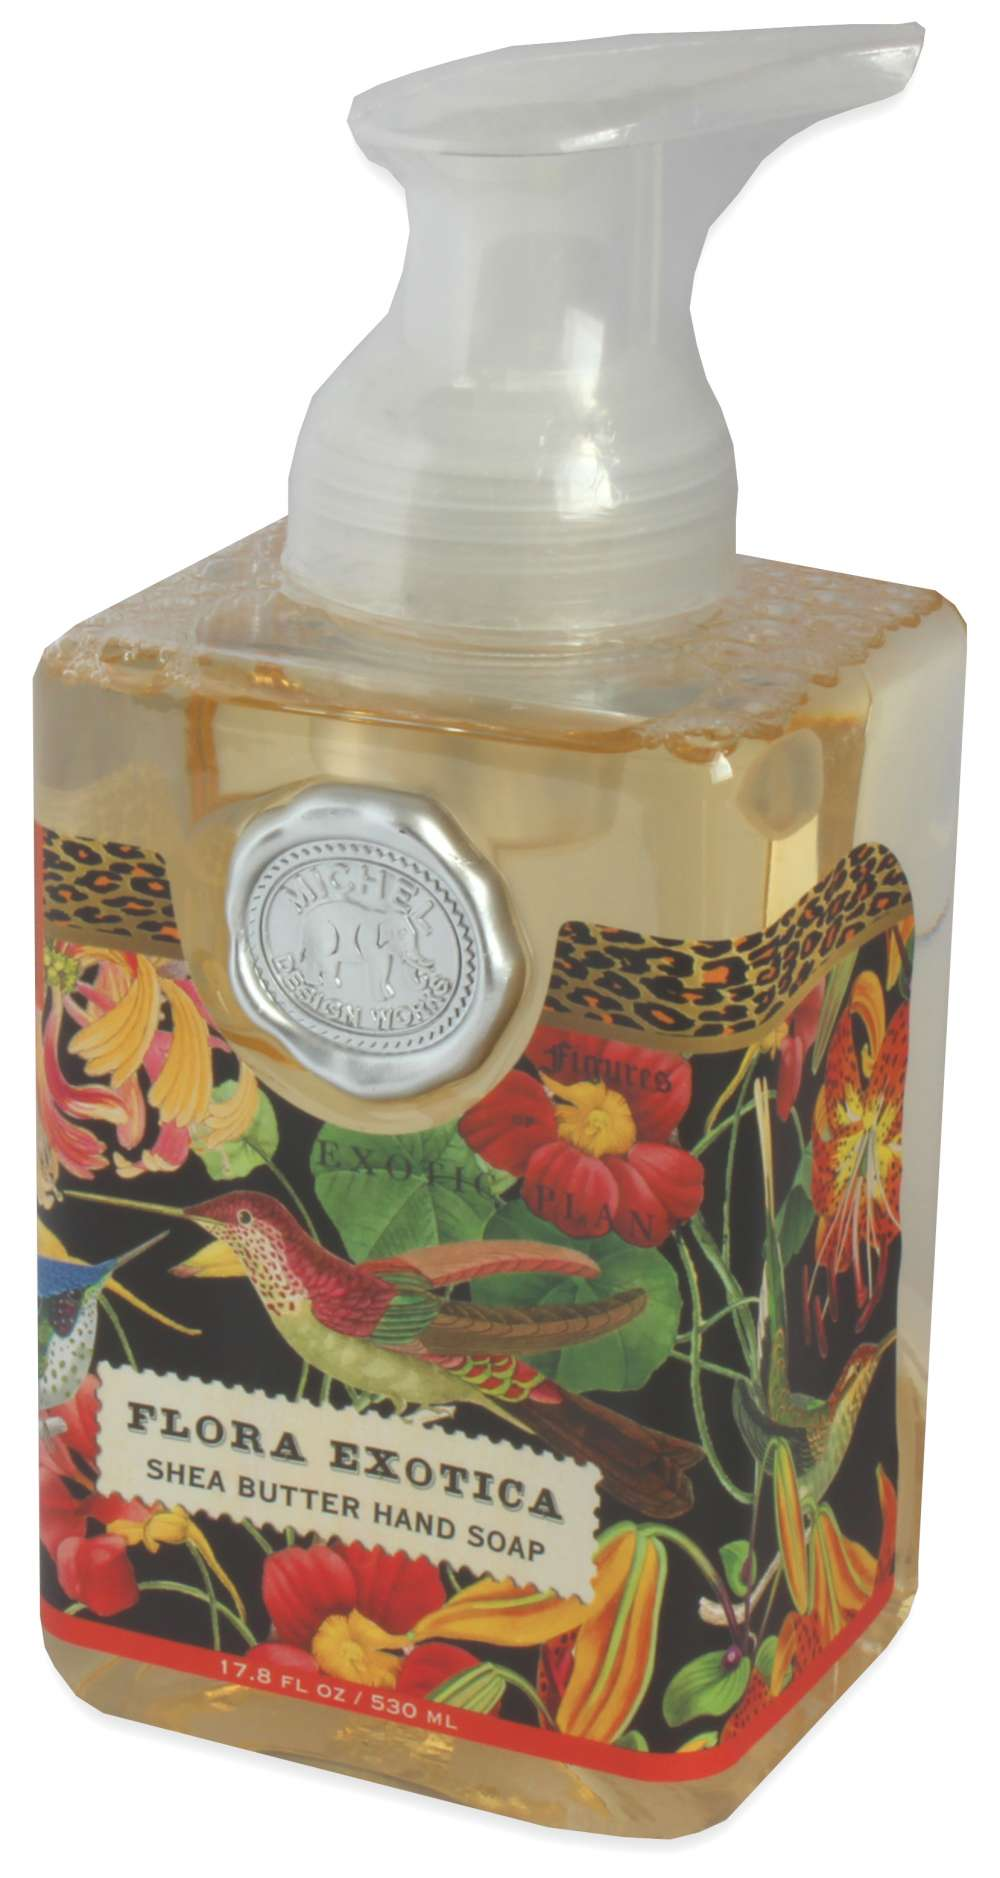 Michel Design Works - Flora Exotica Foaming Hand Soap